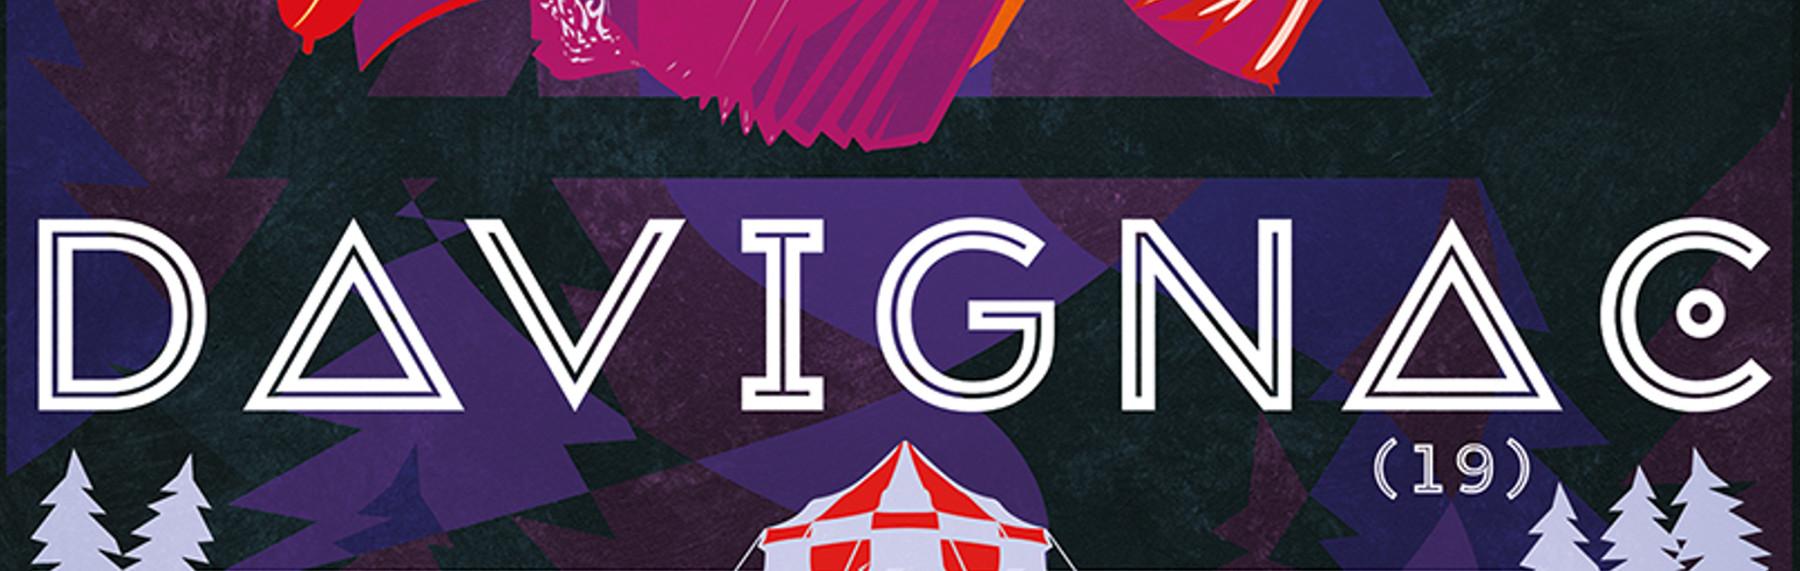 CDLS #7 – Festival de Davignac